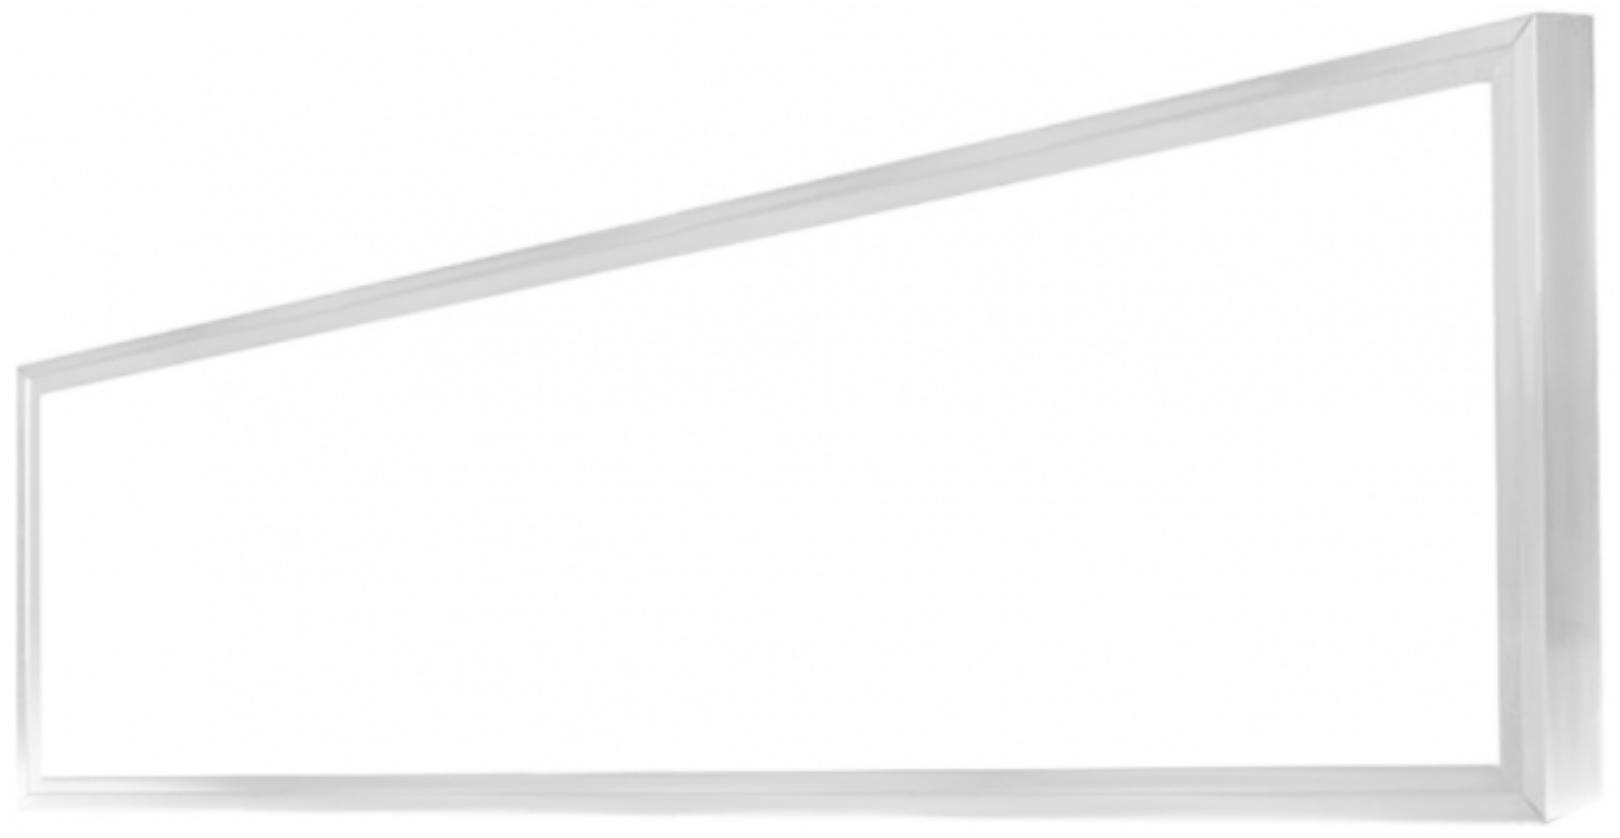 Dimmbarer weisser LED Panel mit Rahmen 300 x 1200mm 48W Warmweiß